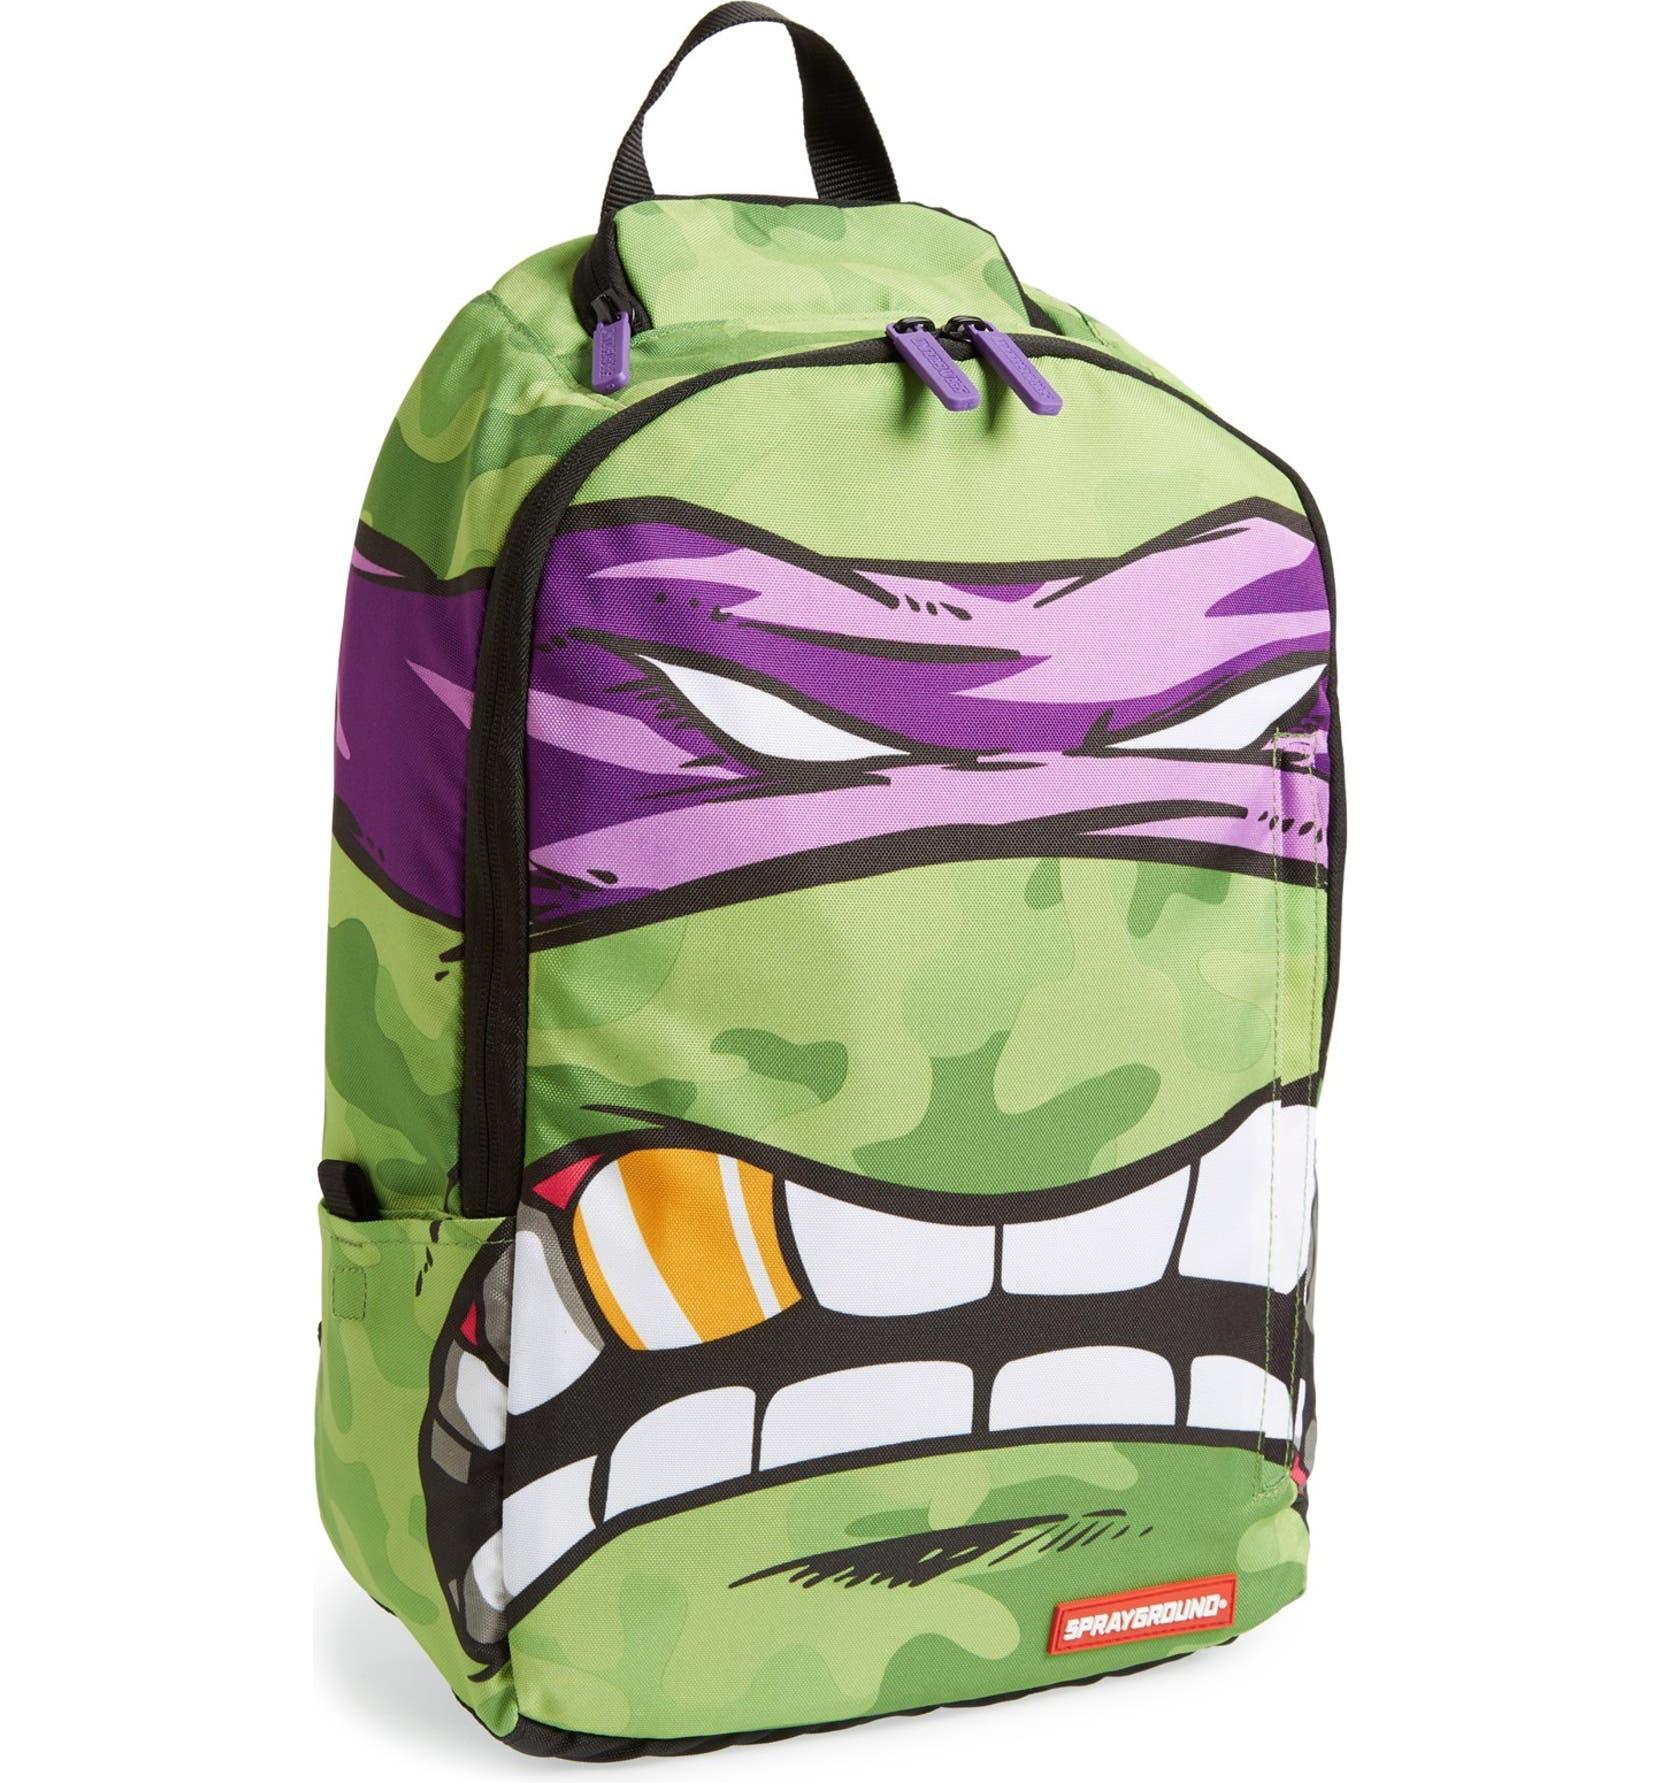 2fbdb70d6f4 Sprayground 'Teenage Mutant Ninja Turtles™ - Grillz' Backpack (Boys) |  Nordstrom